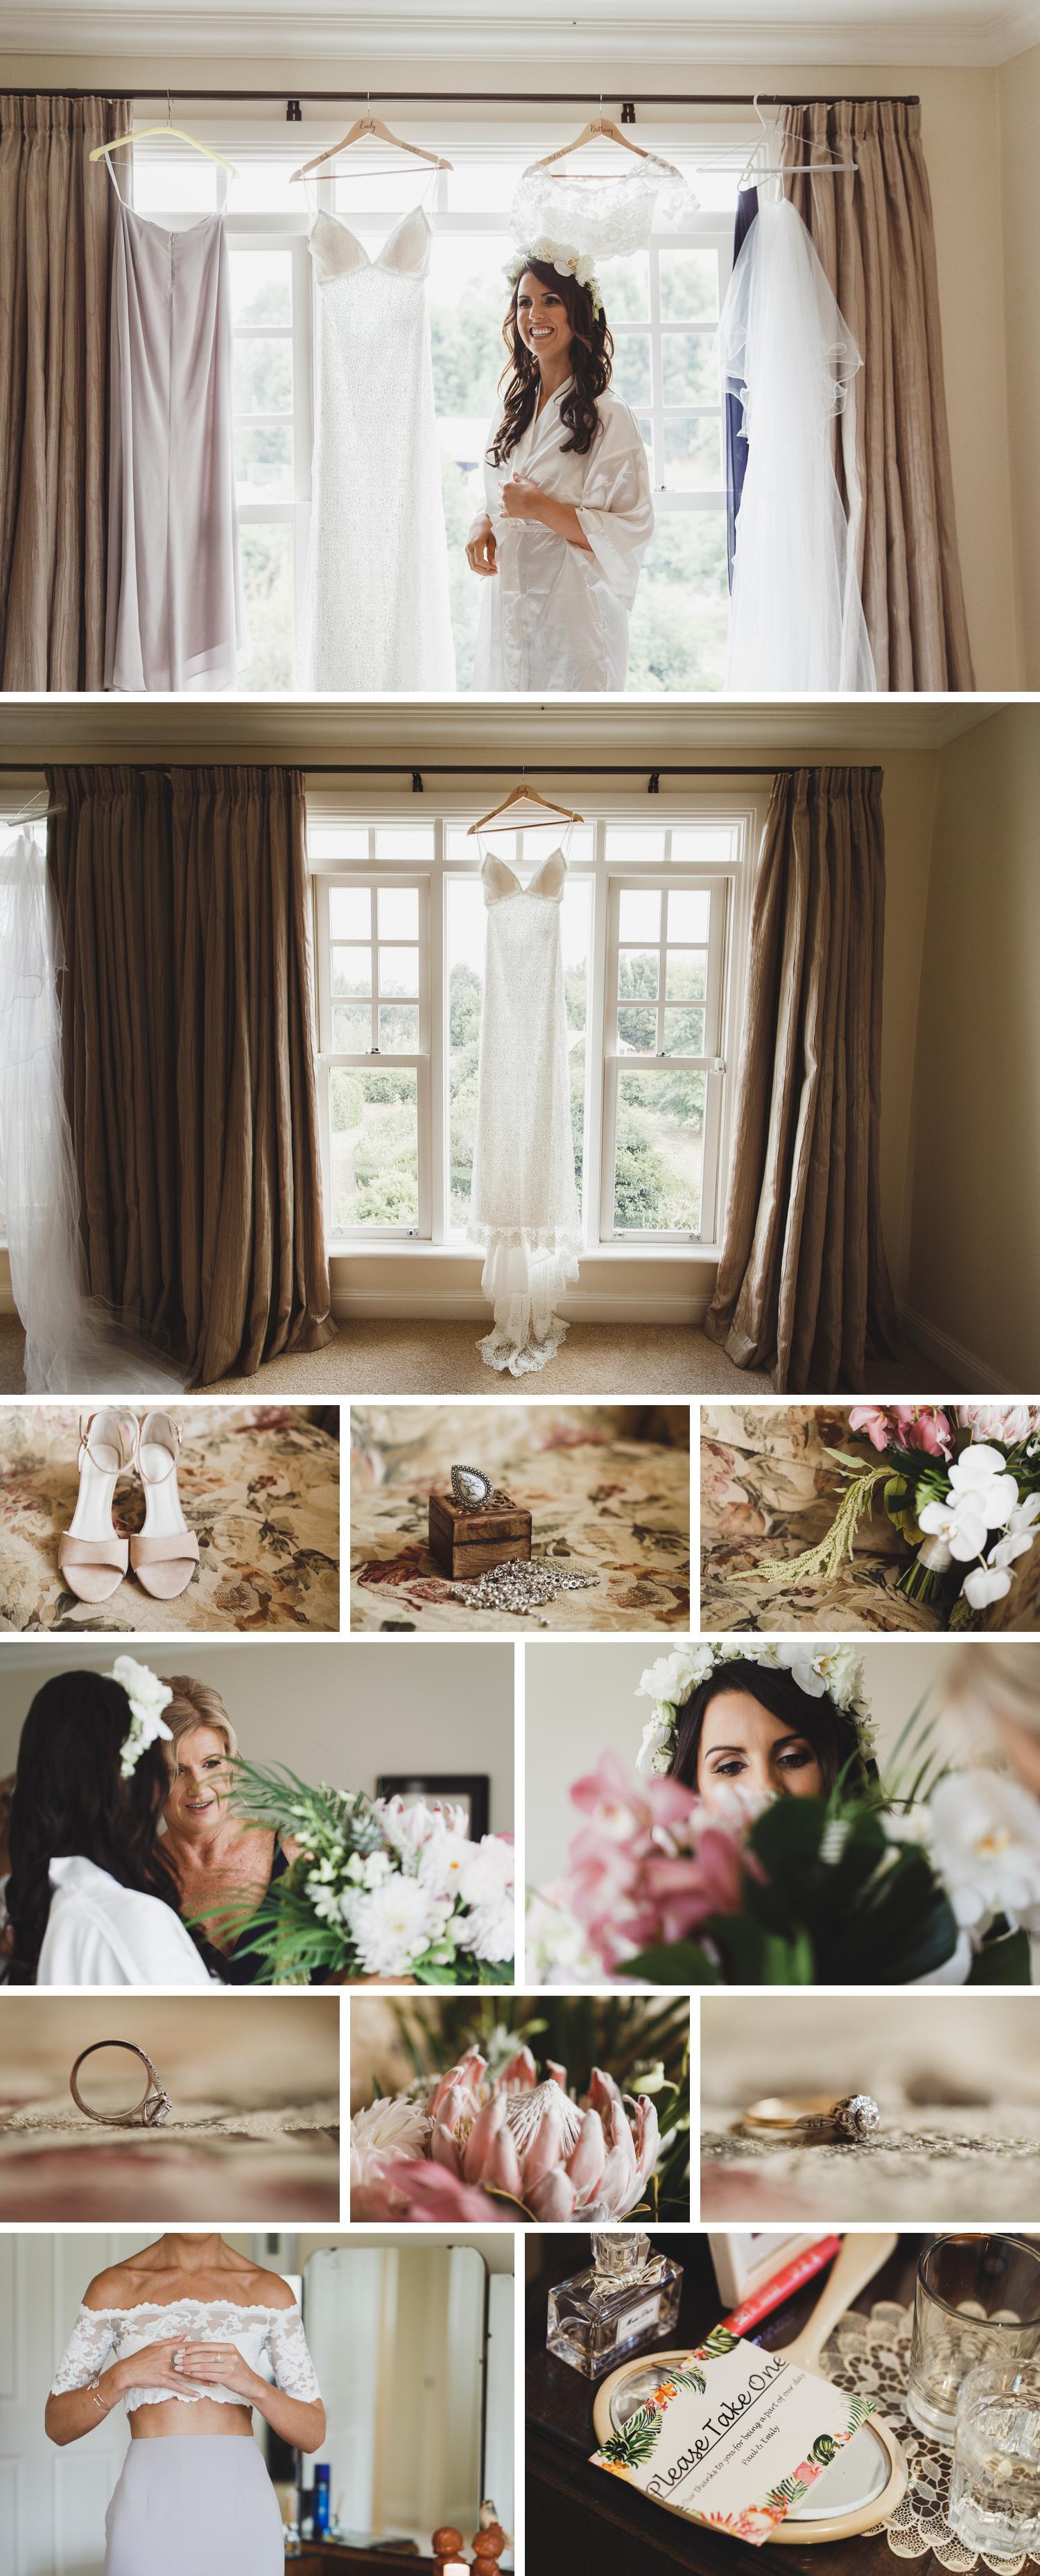 Tropical Boho Wedding, Rural Wedding on Family Property, Detail Wedding Photo by Danae Studios